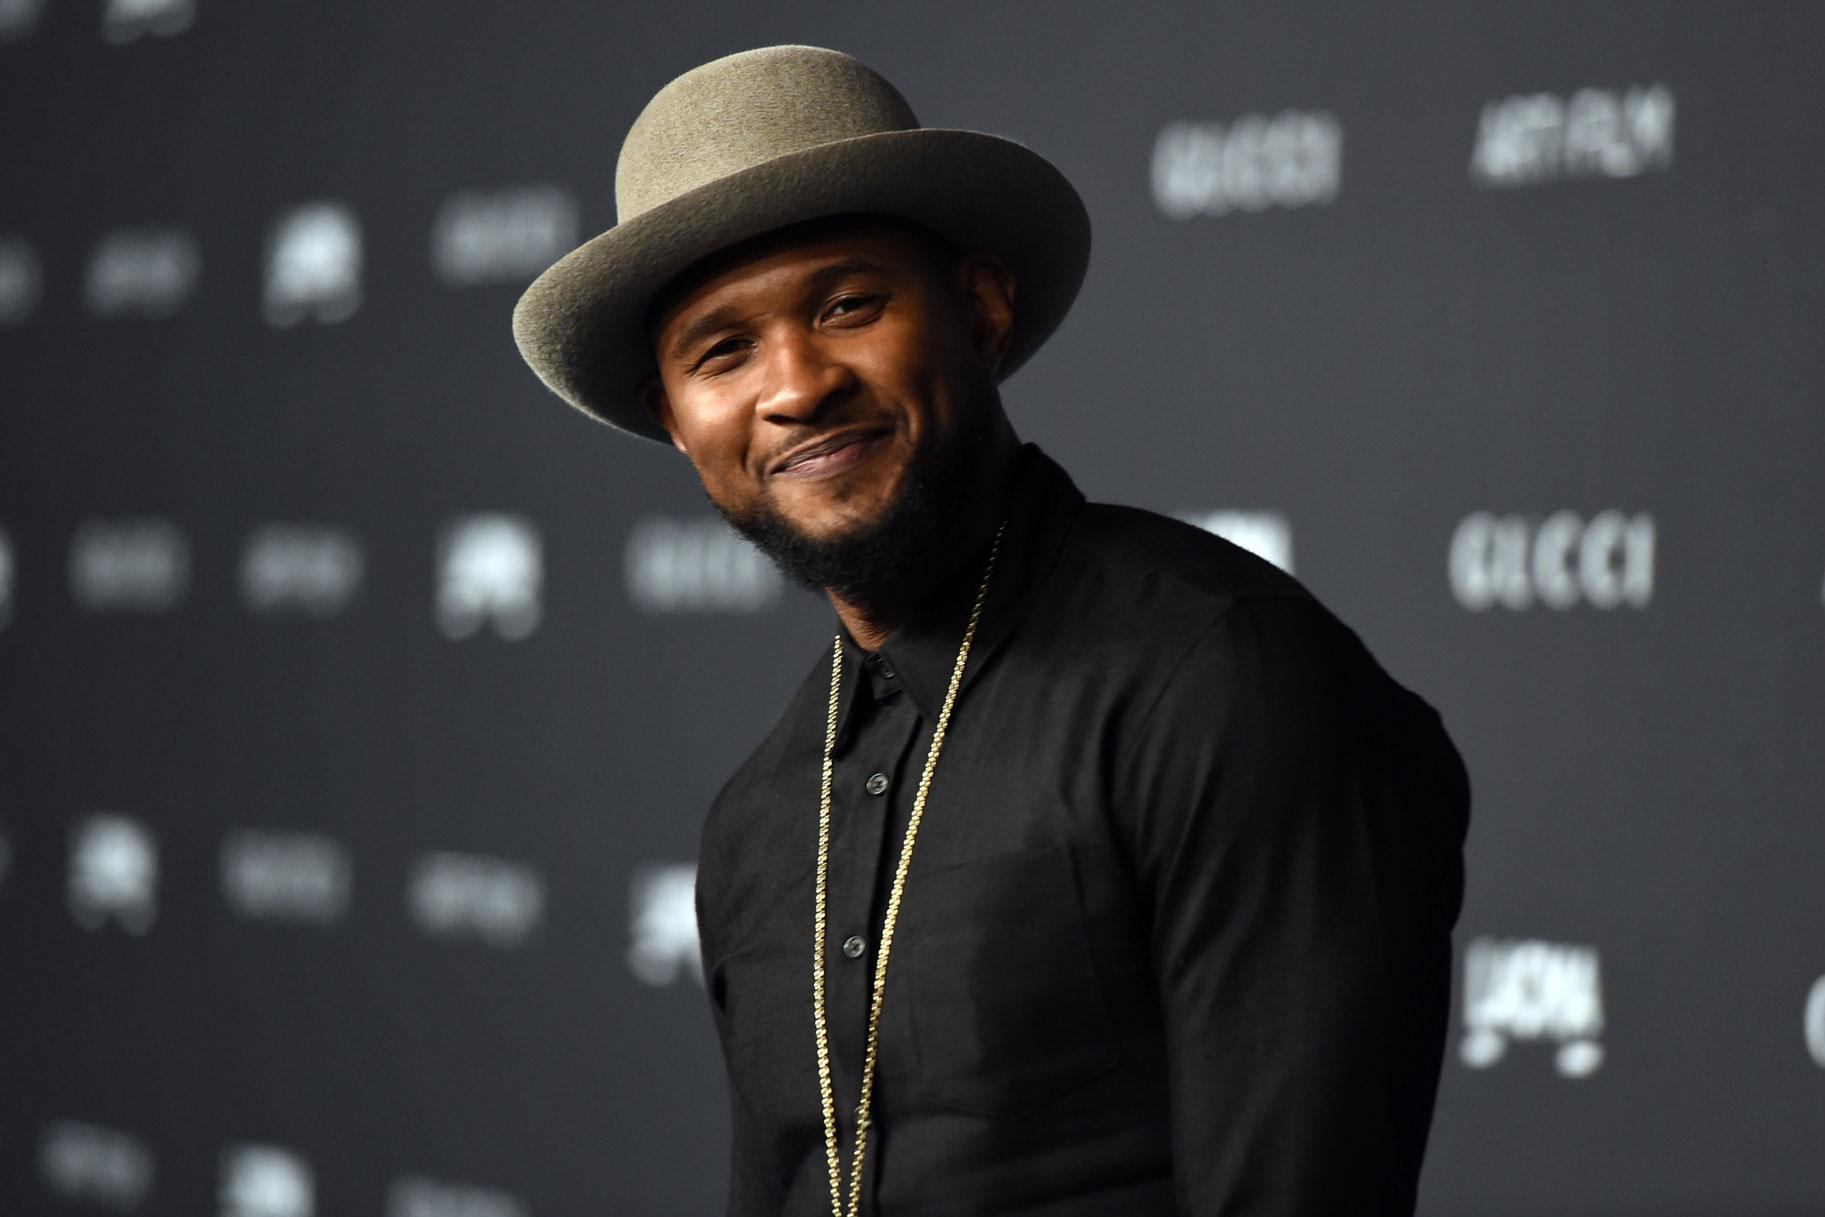 Usher roller shoes video - Usher Roller Shoes Video 8